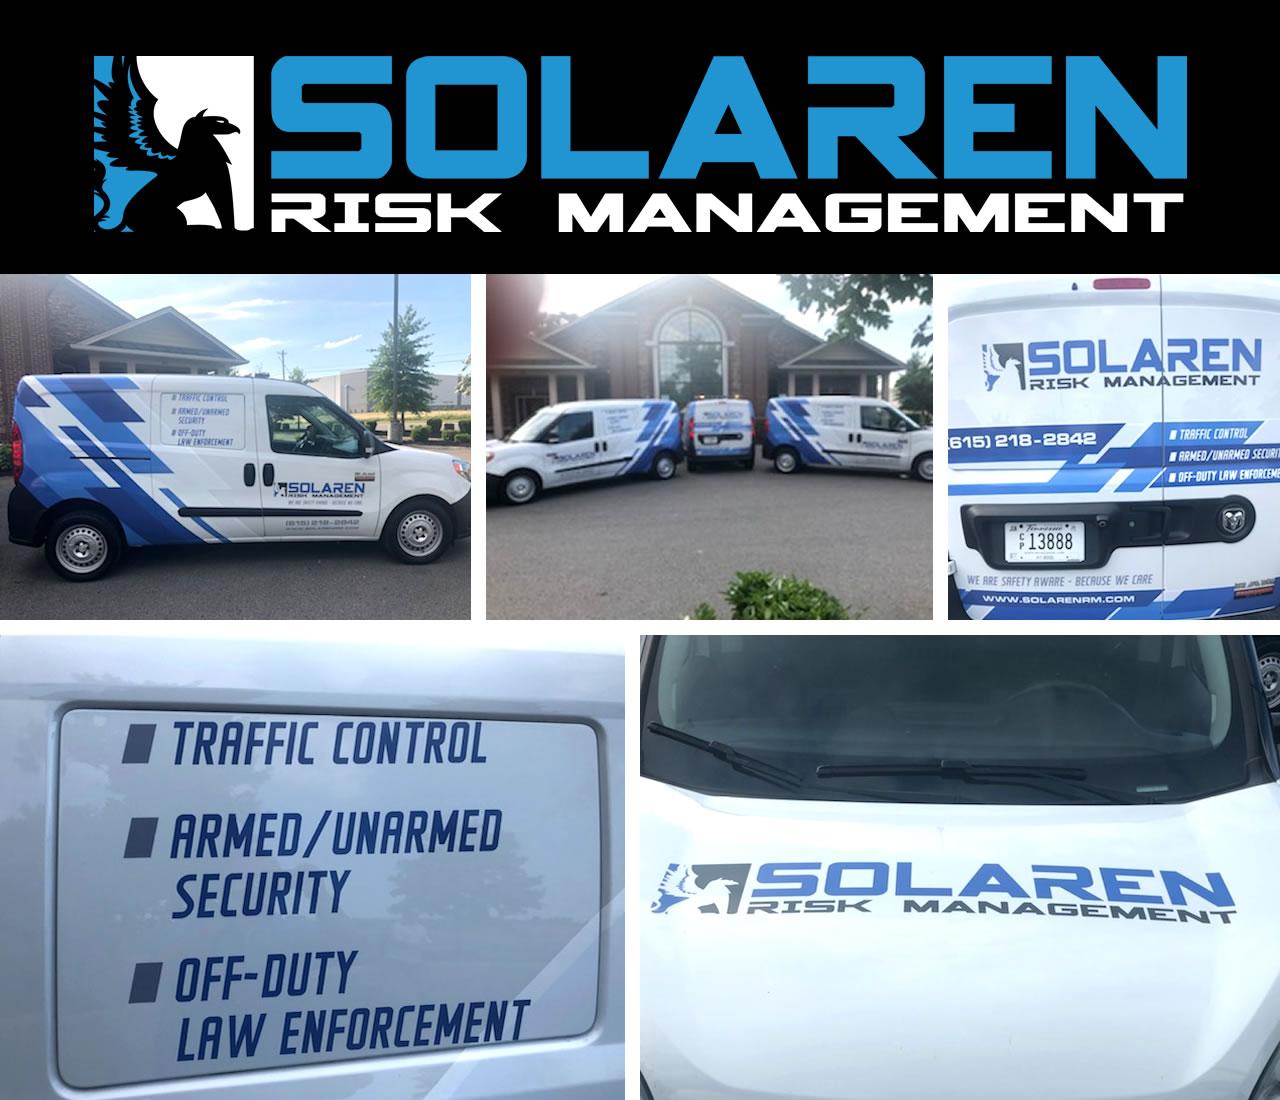 solaren-nashville-traffic-control-work-zone-safety-paving-flagger-company